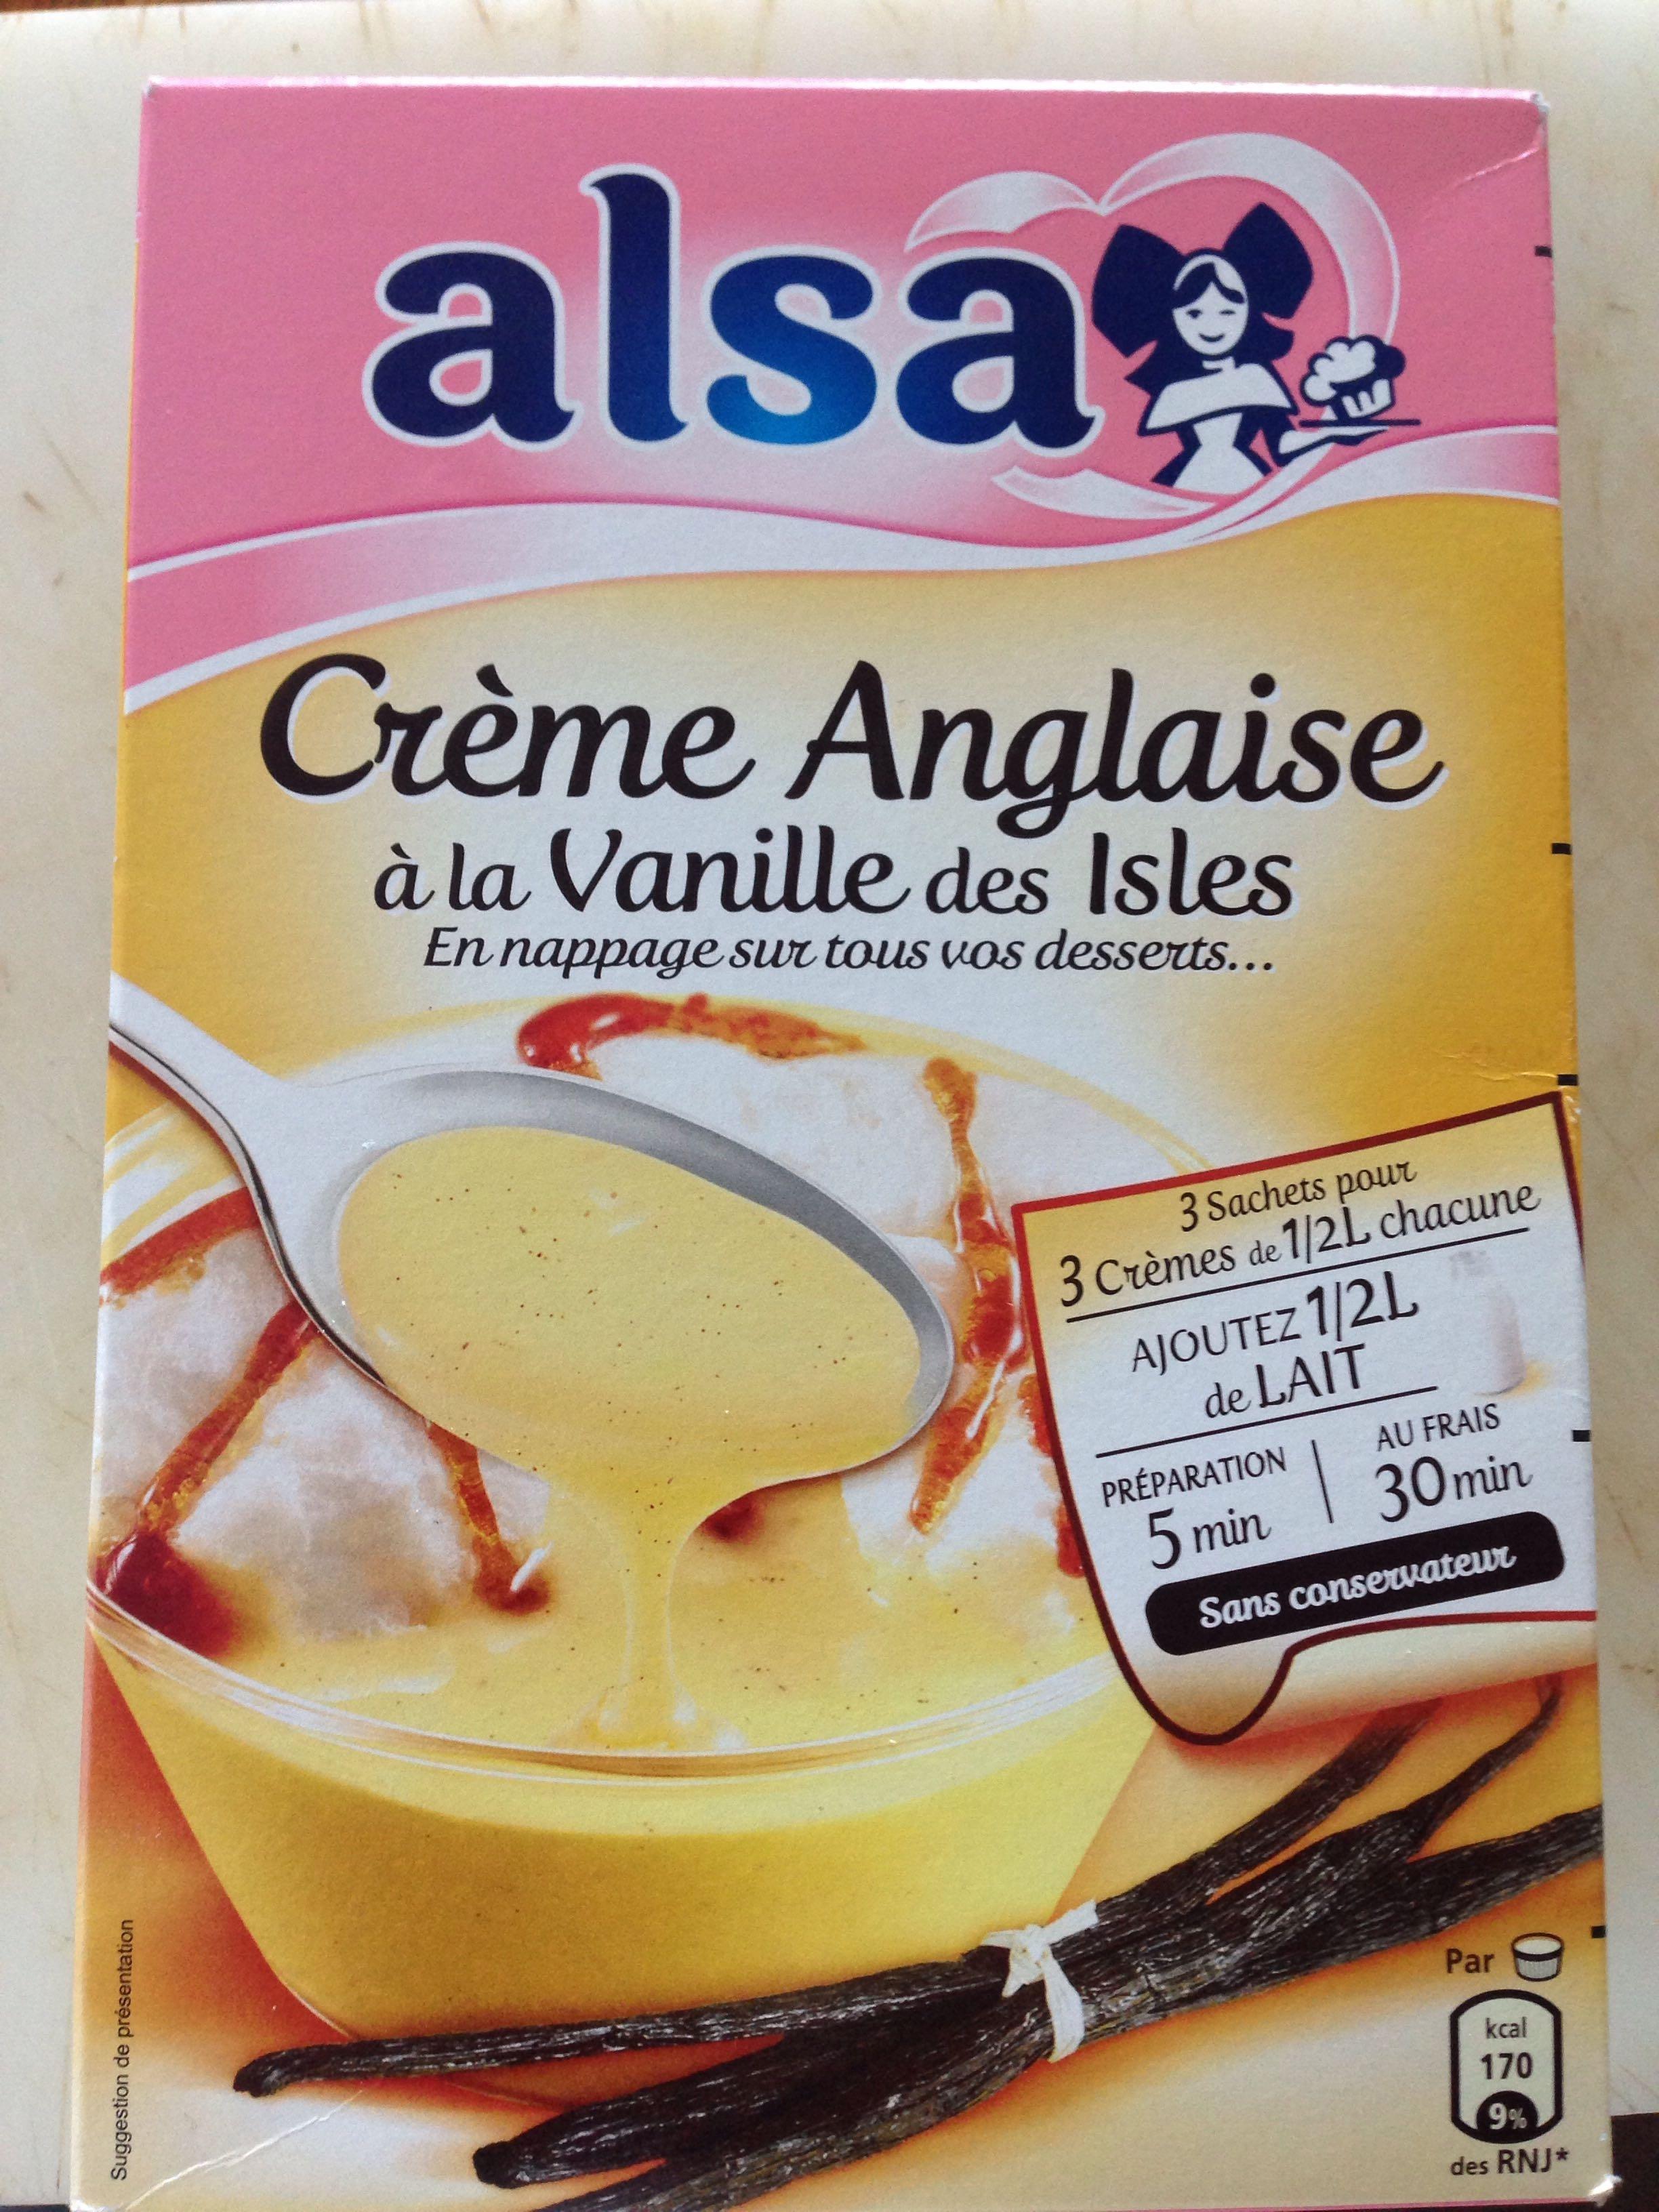 Cr me anglaise la vanille des isles alsa 900 g - Creme anglaise ...